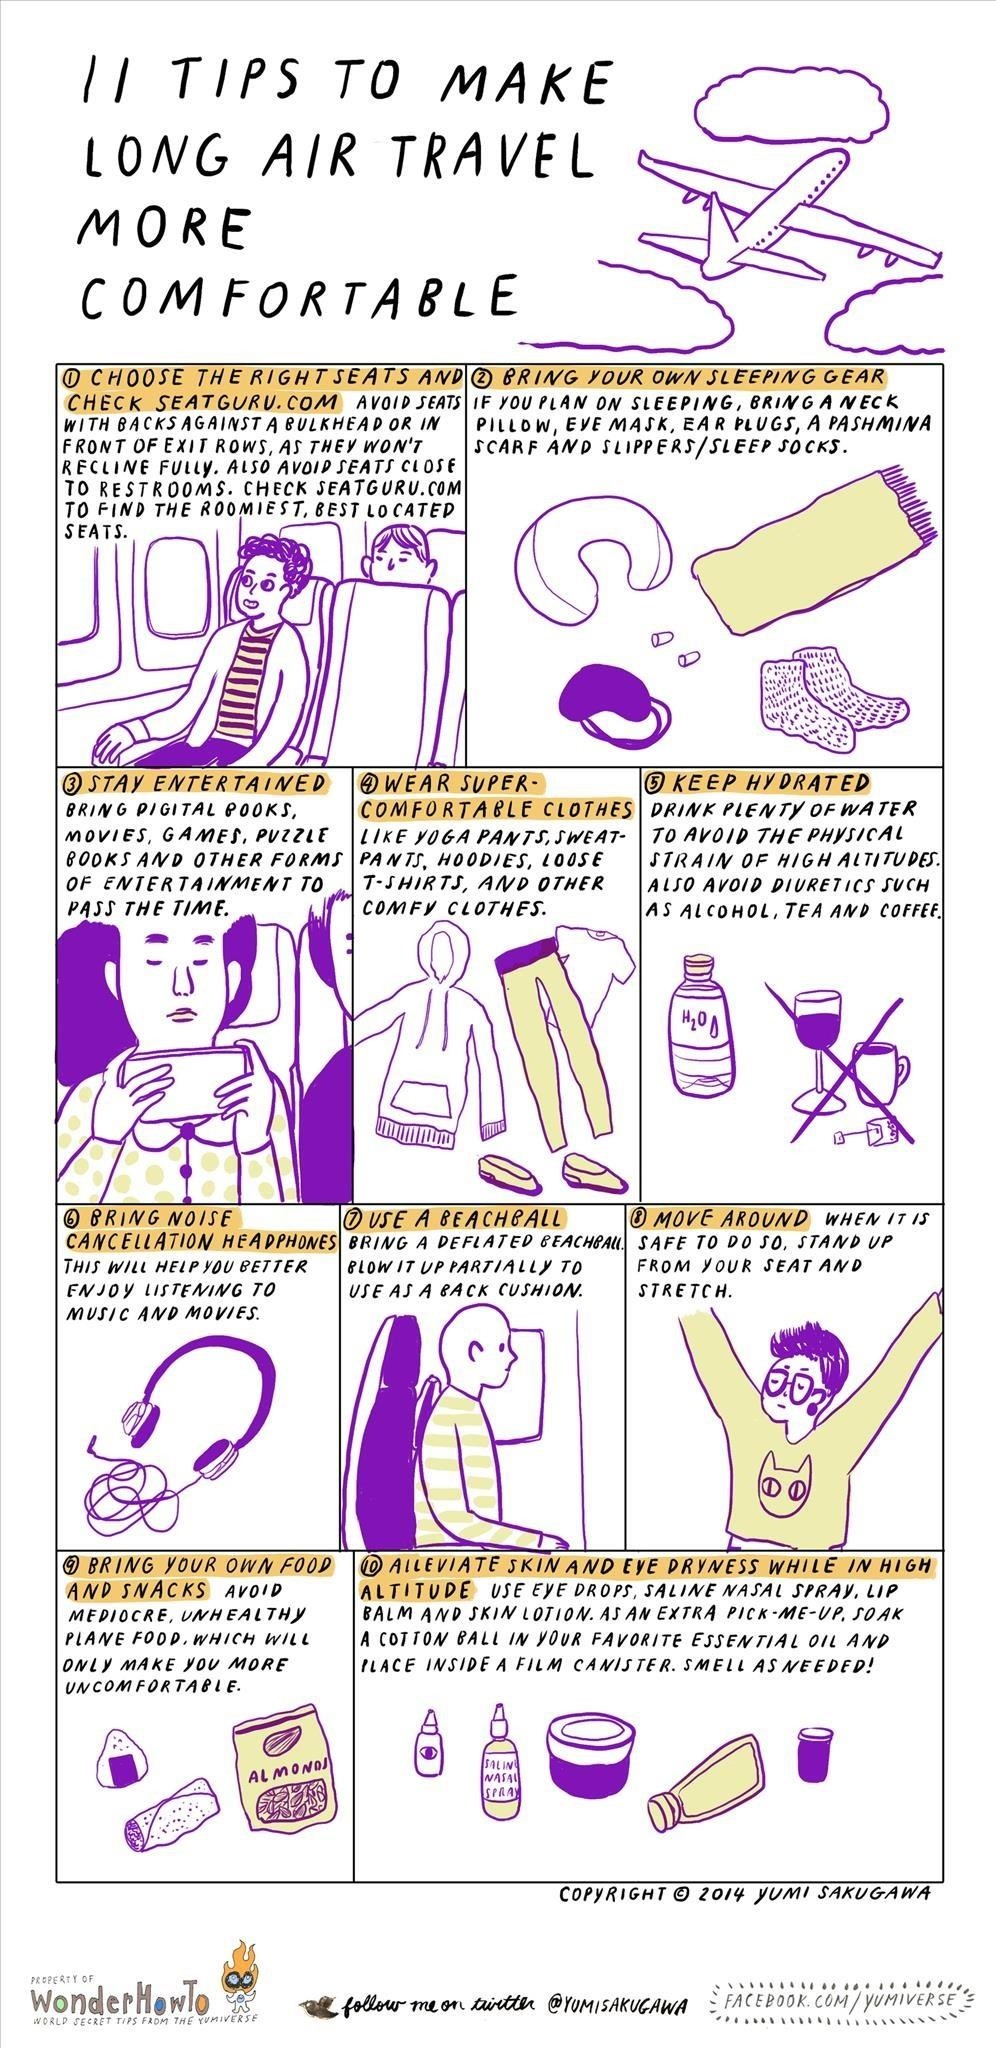 How to Make Long Holiday Flights More Comfortable